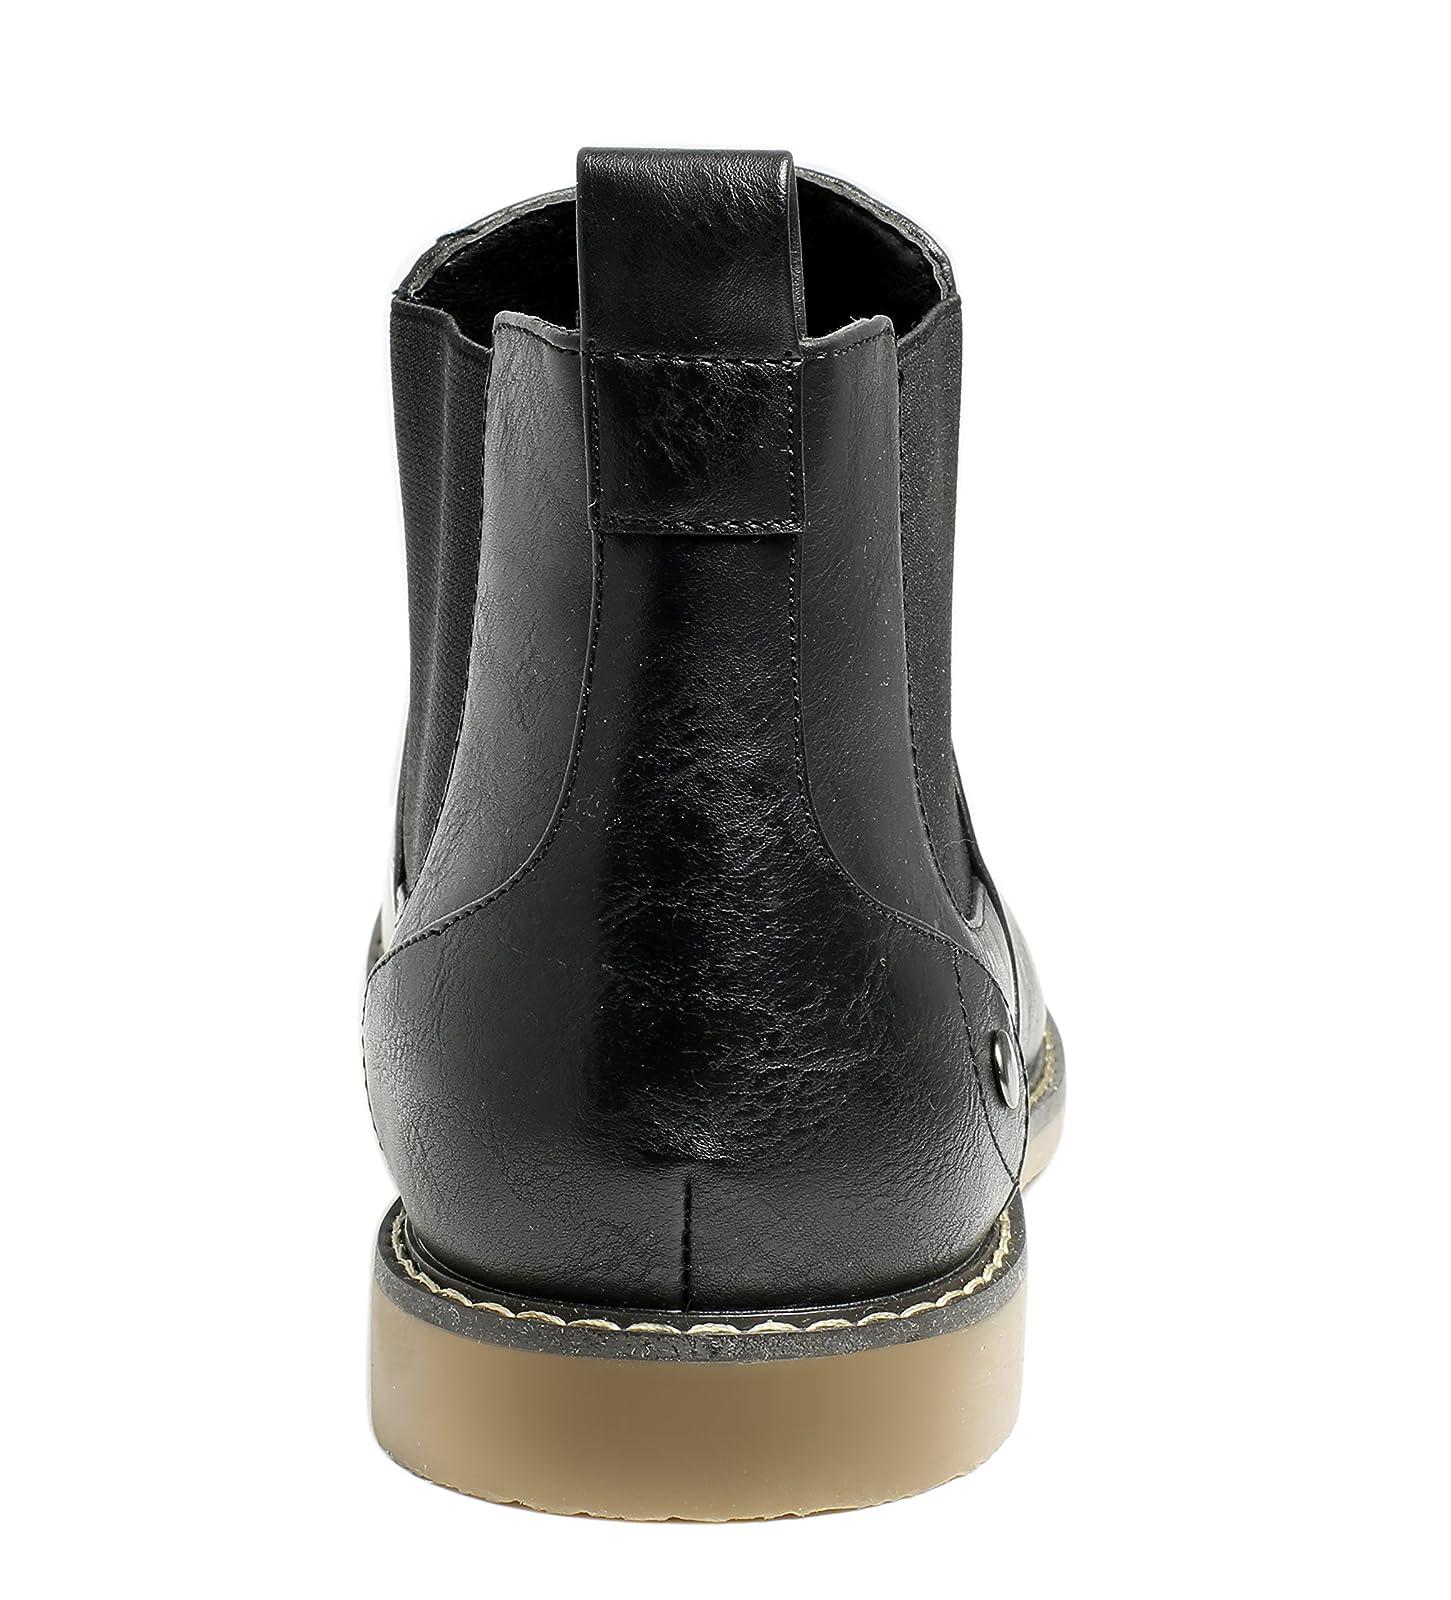 PartyEight Mens Ankle Casual Chelsea Boots Medium (D, M) US Men - 3